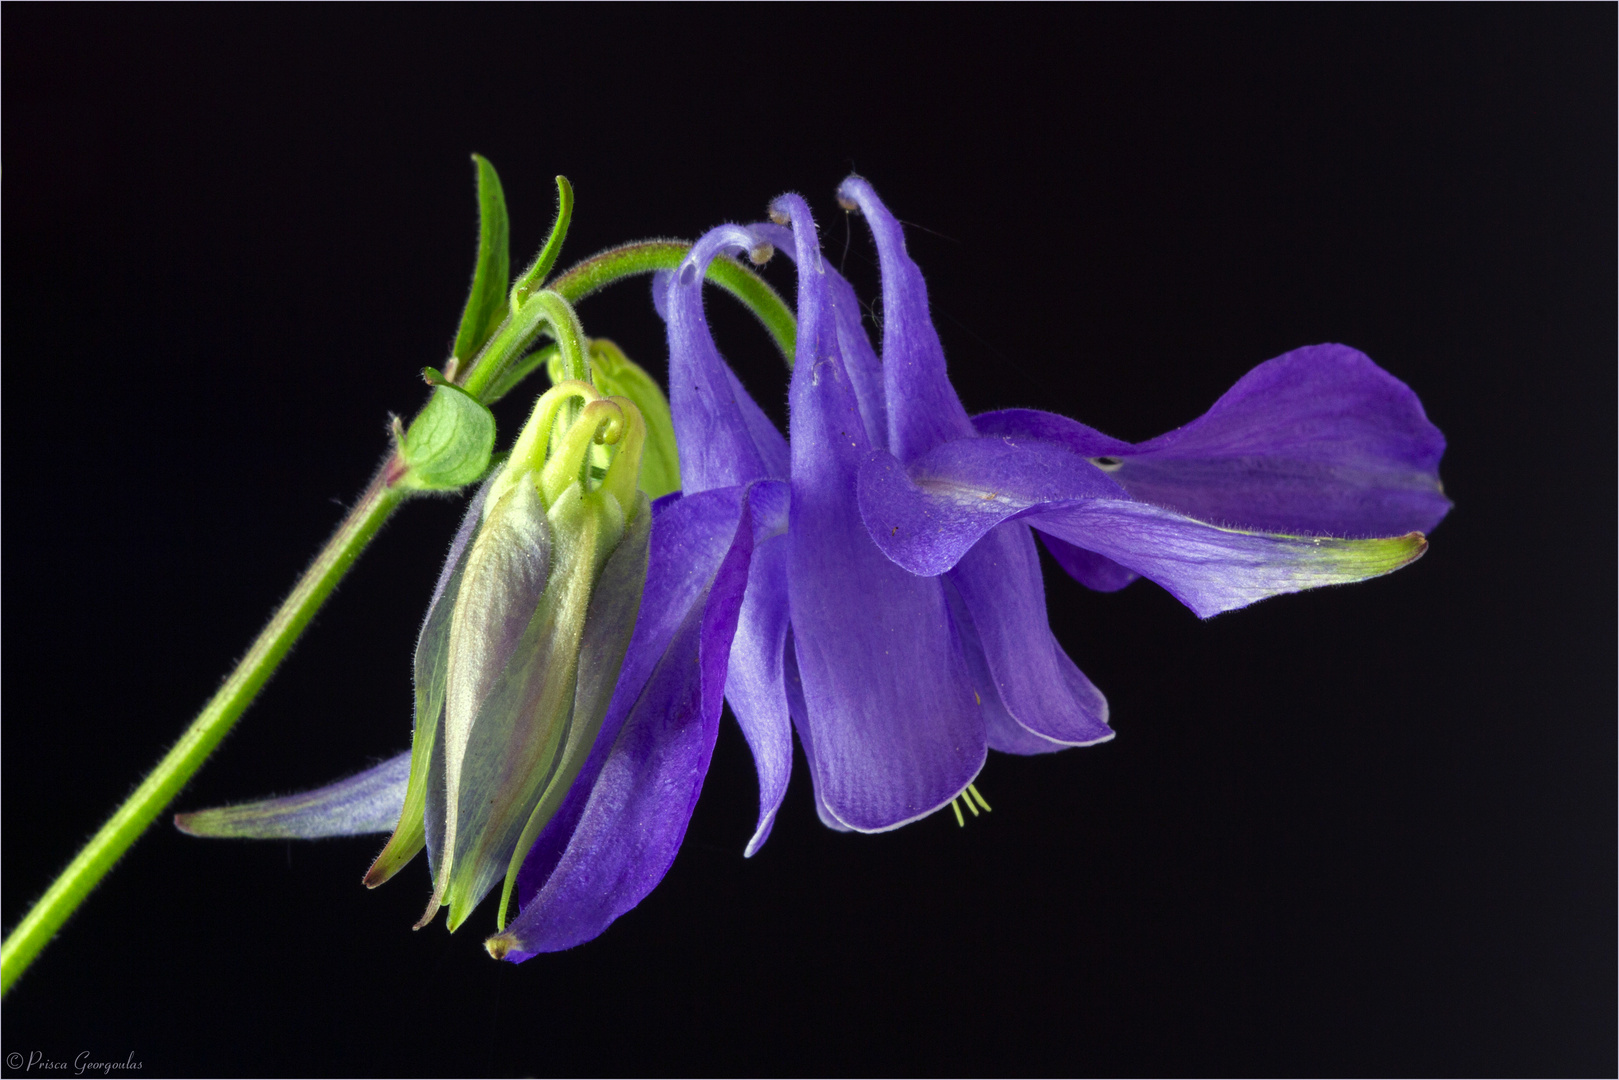 Aguilegia vulgaris - Gemeine Akelei